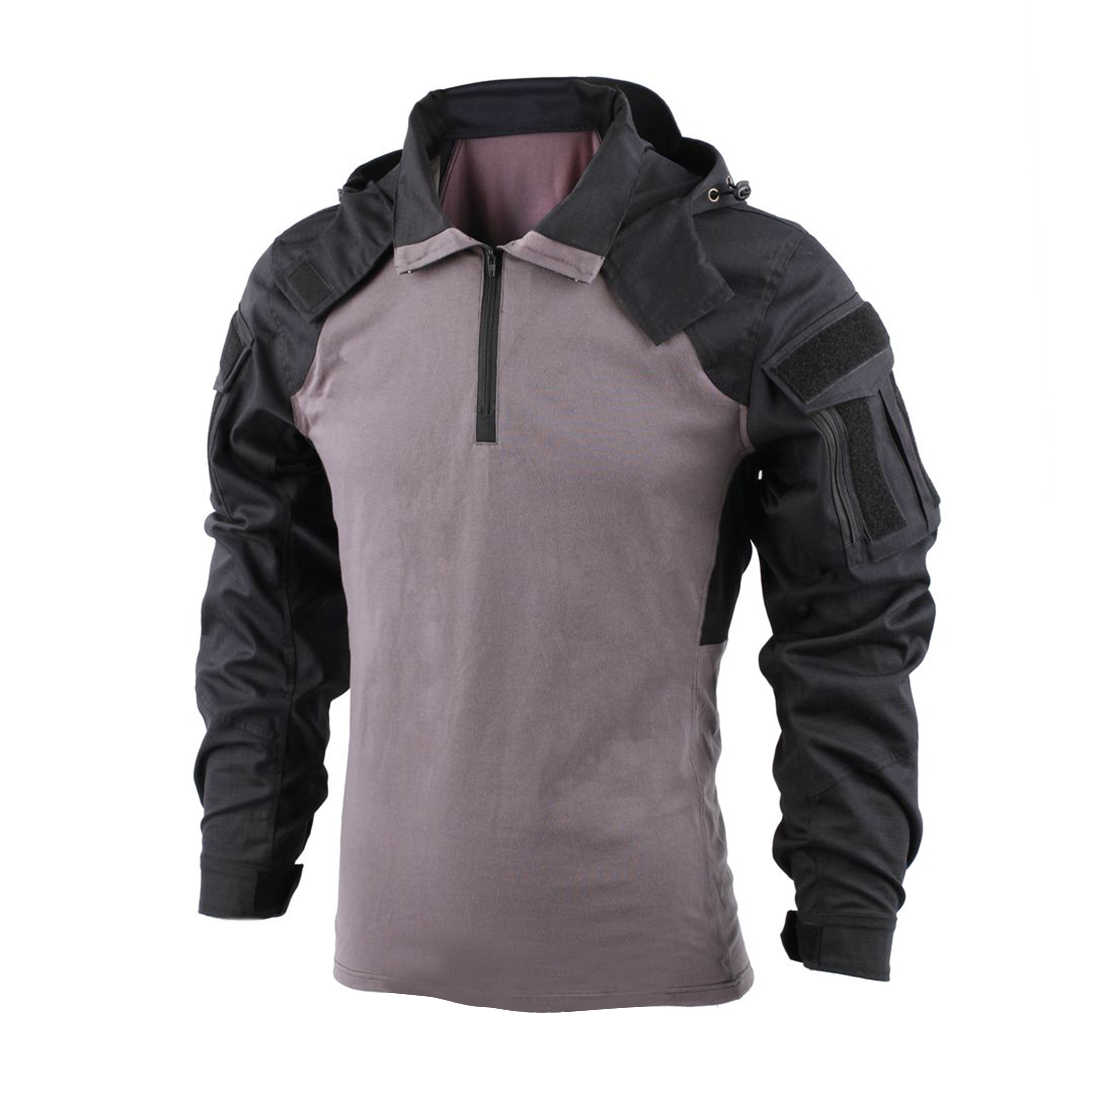 NewBACRAFT, camisa táctica, uniforme de combate, equipo para exteriores, versión SP2, negro, gris, M/L/XL